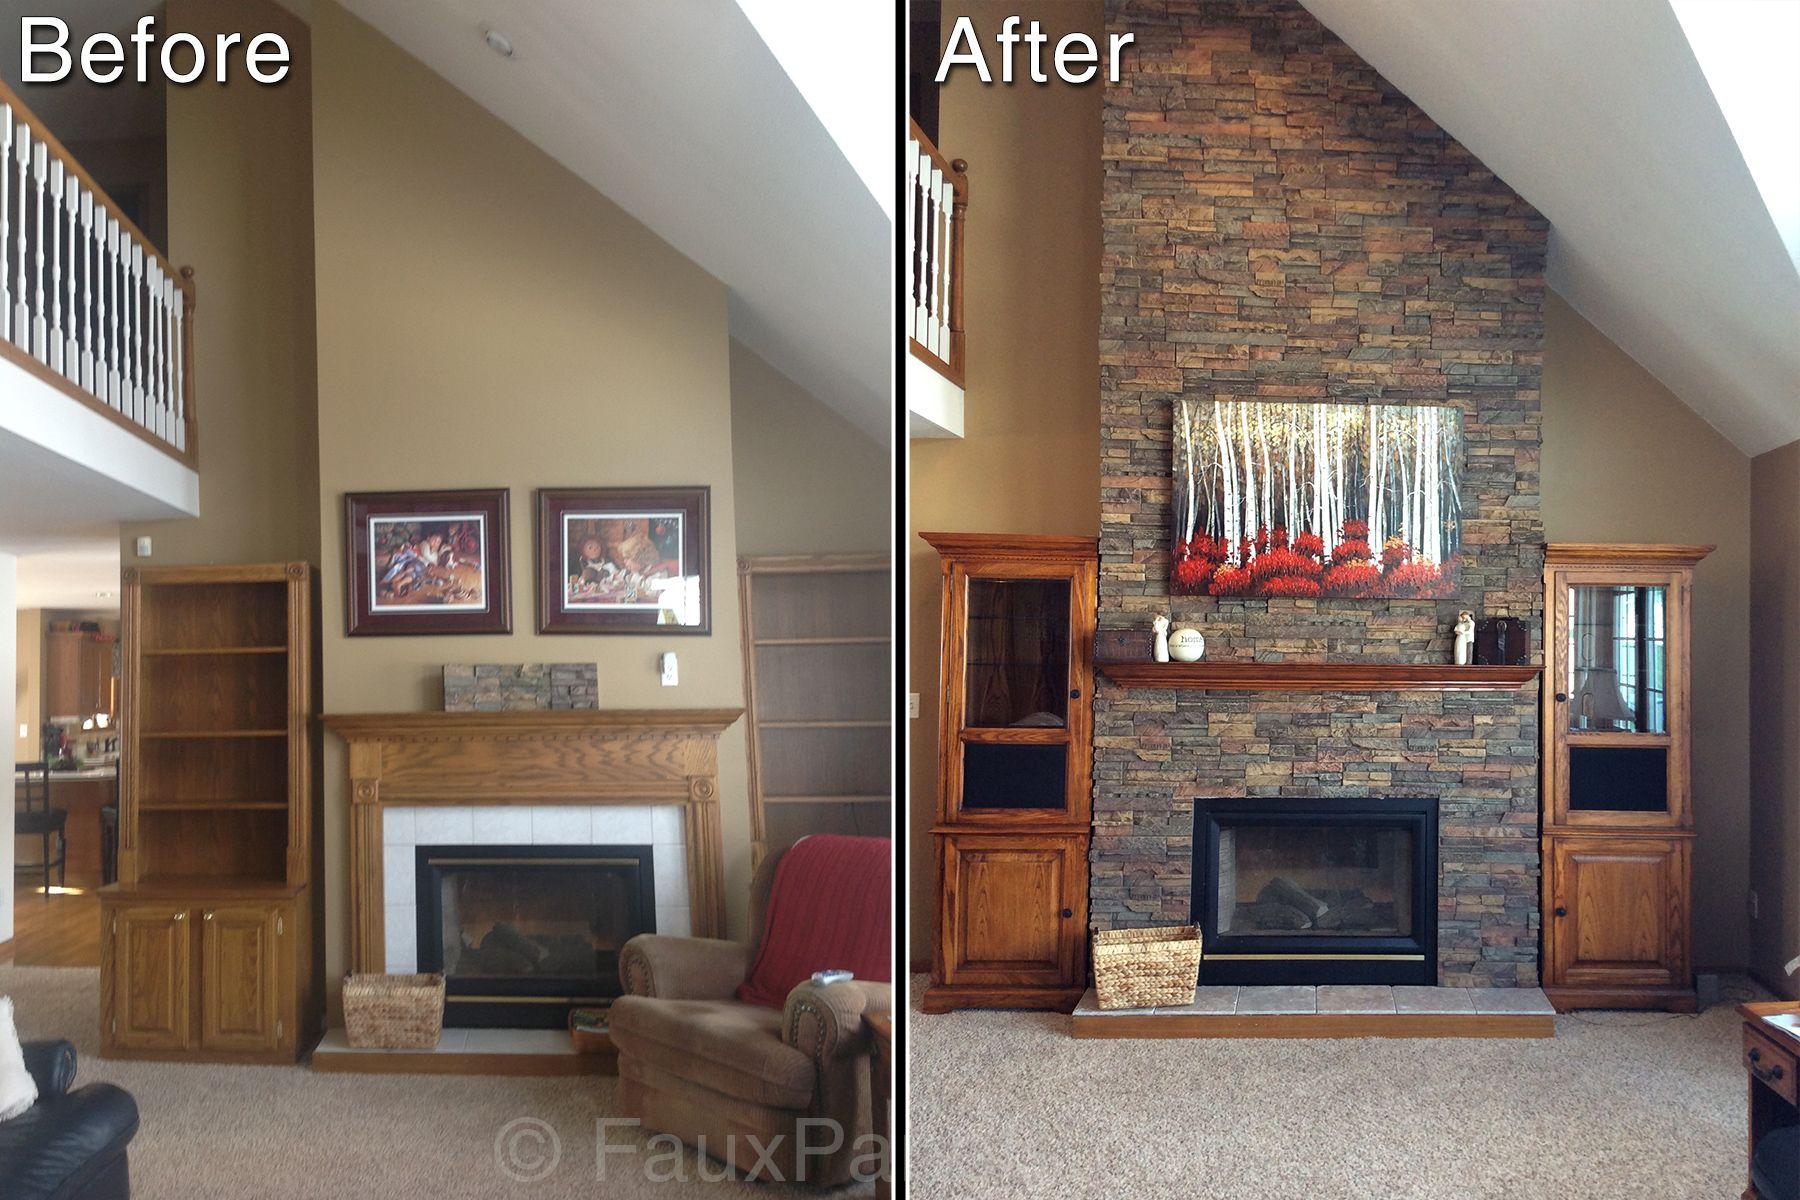 Fireplaces Portfolio Reface Fireplace Faux Panels Brick Fireplace